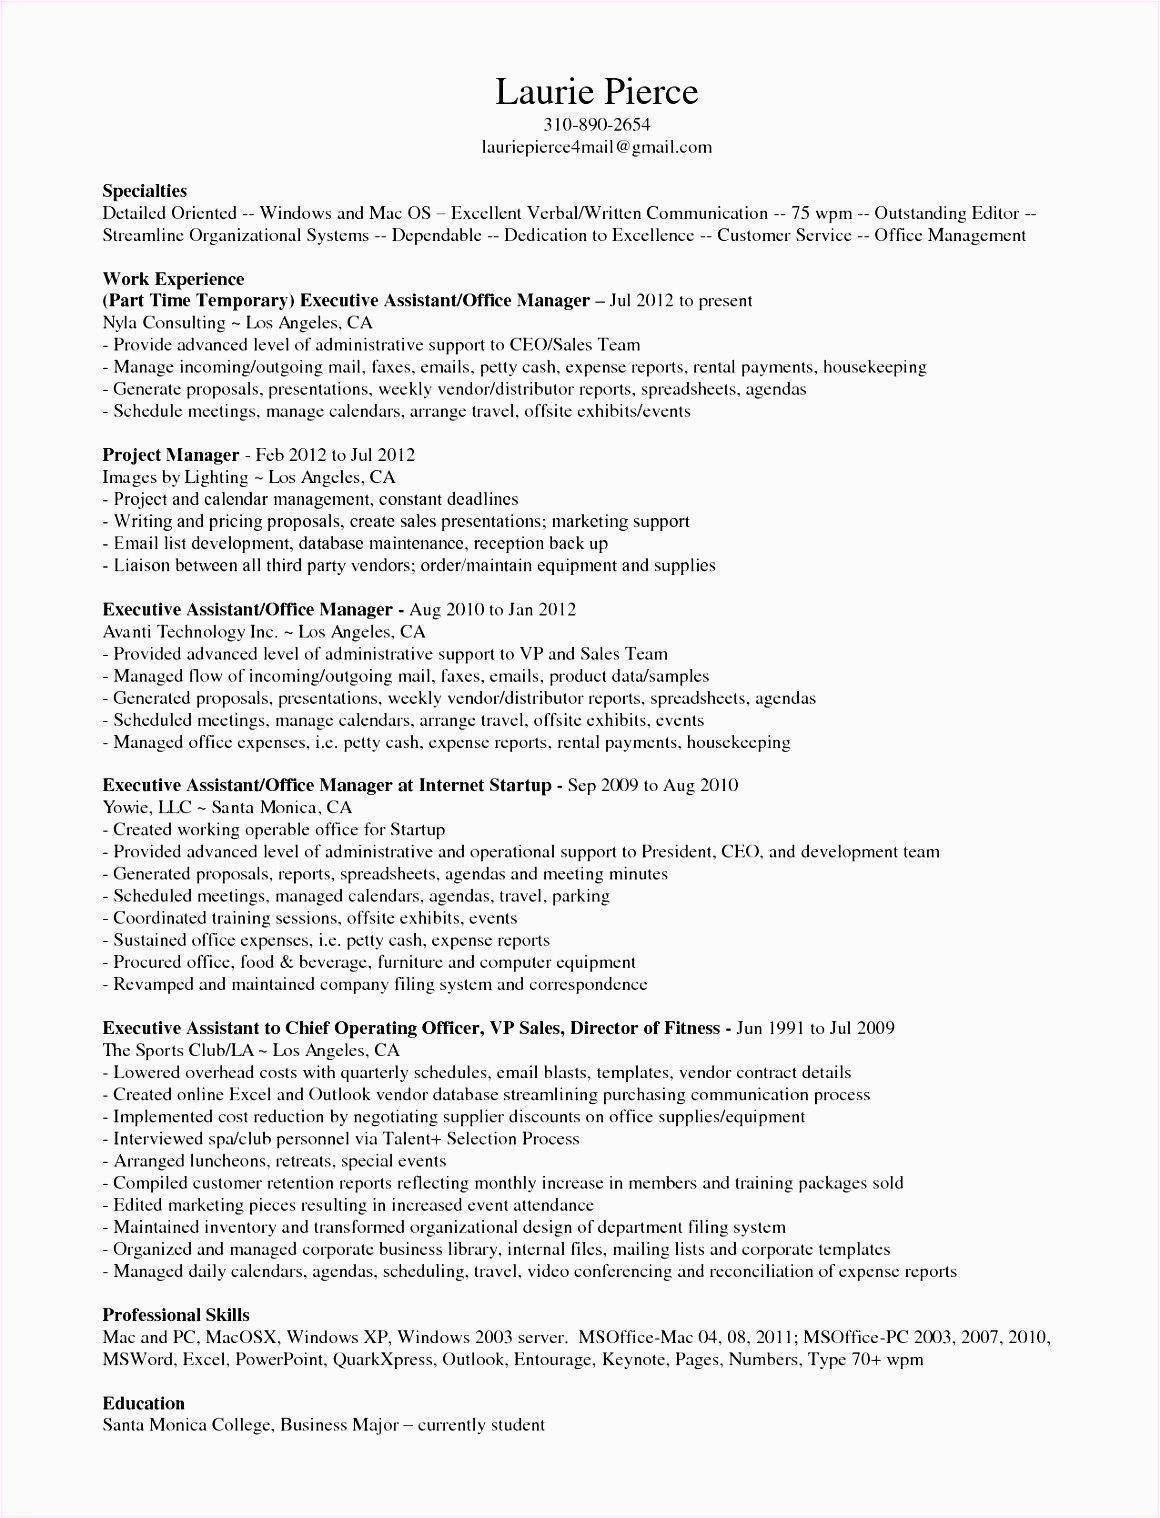 Airline Customer Service Representative Resume Sample √ 20 Airline Customer Service Resume